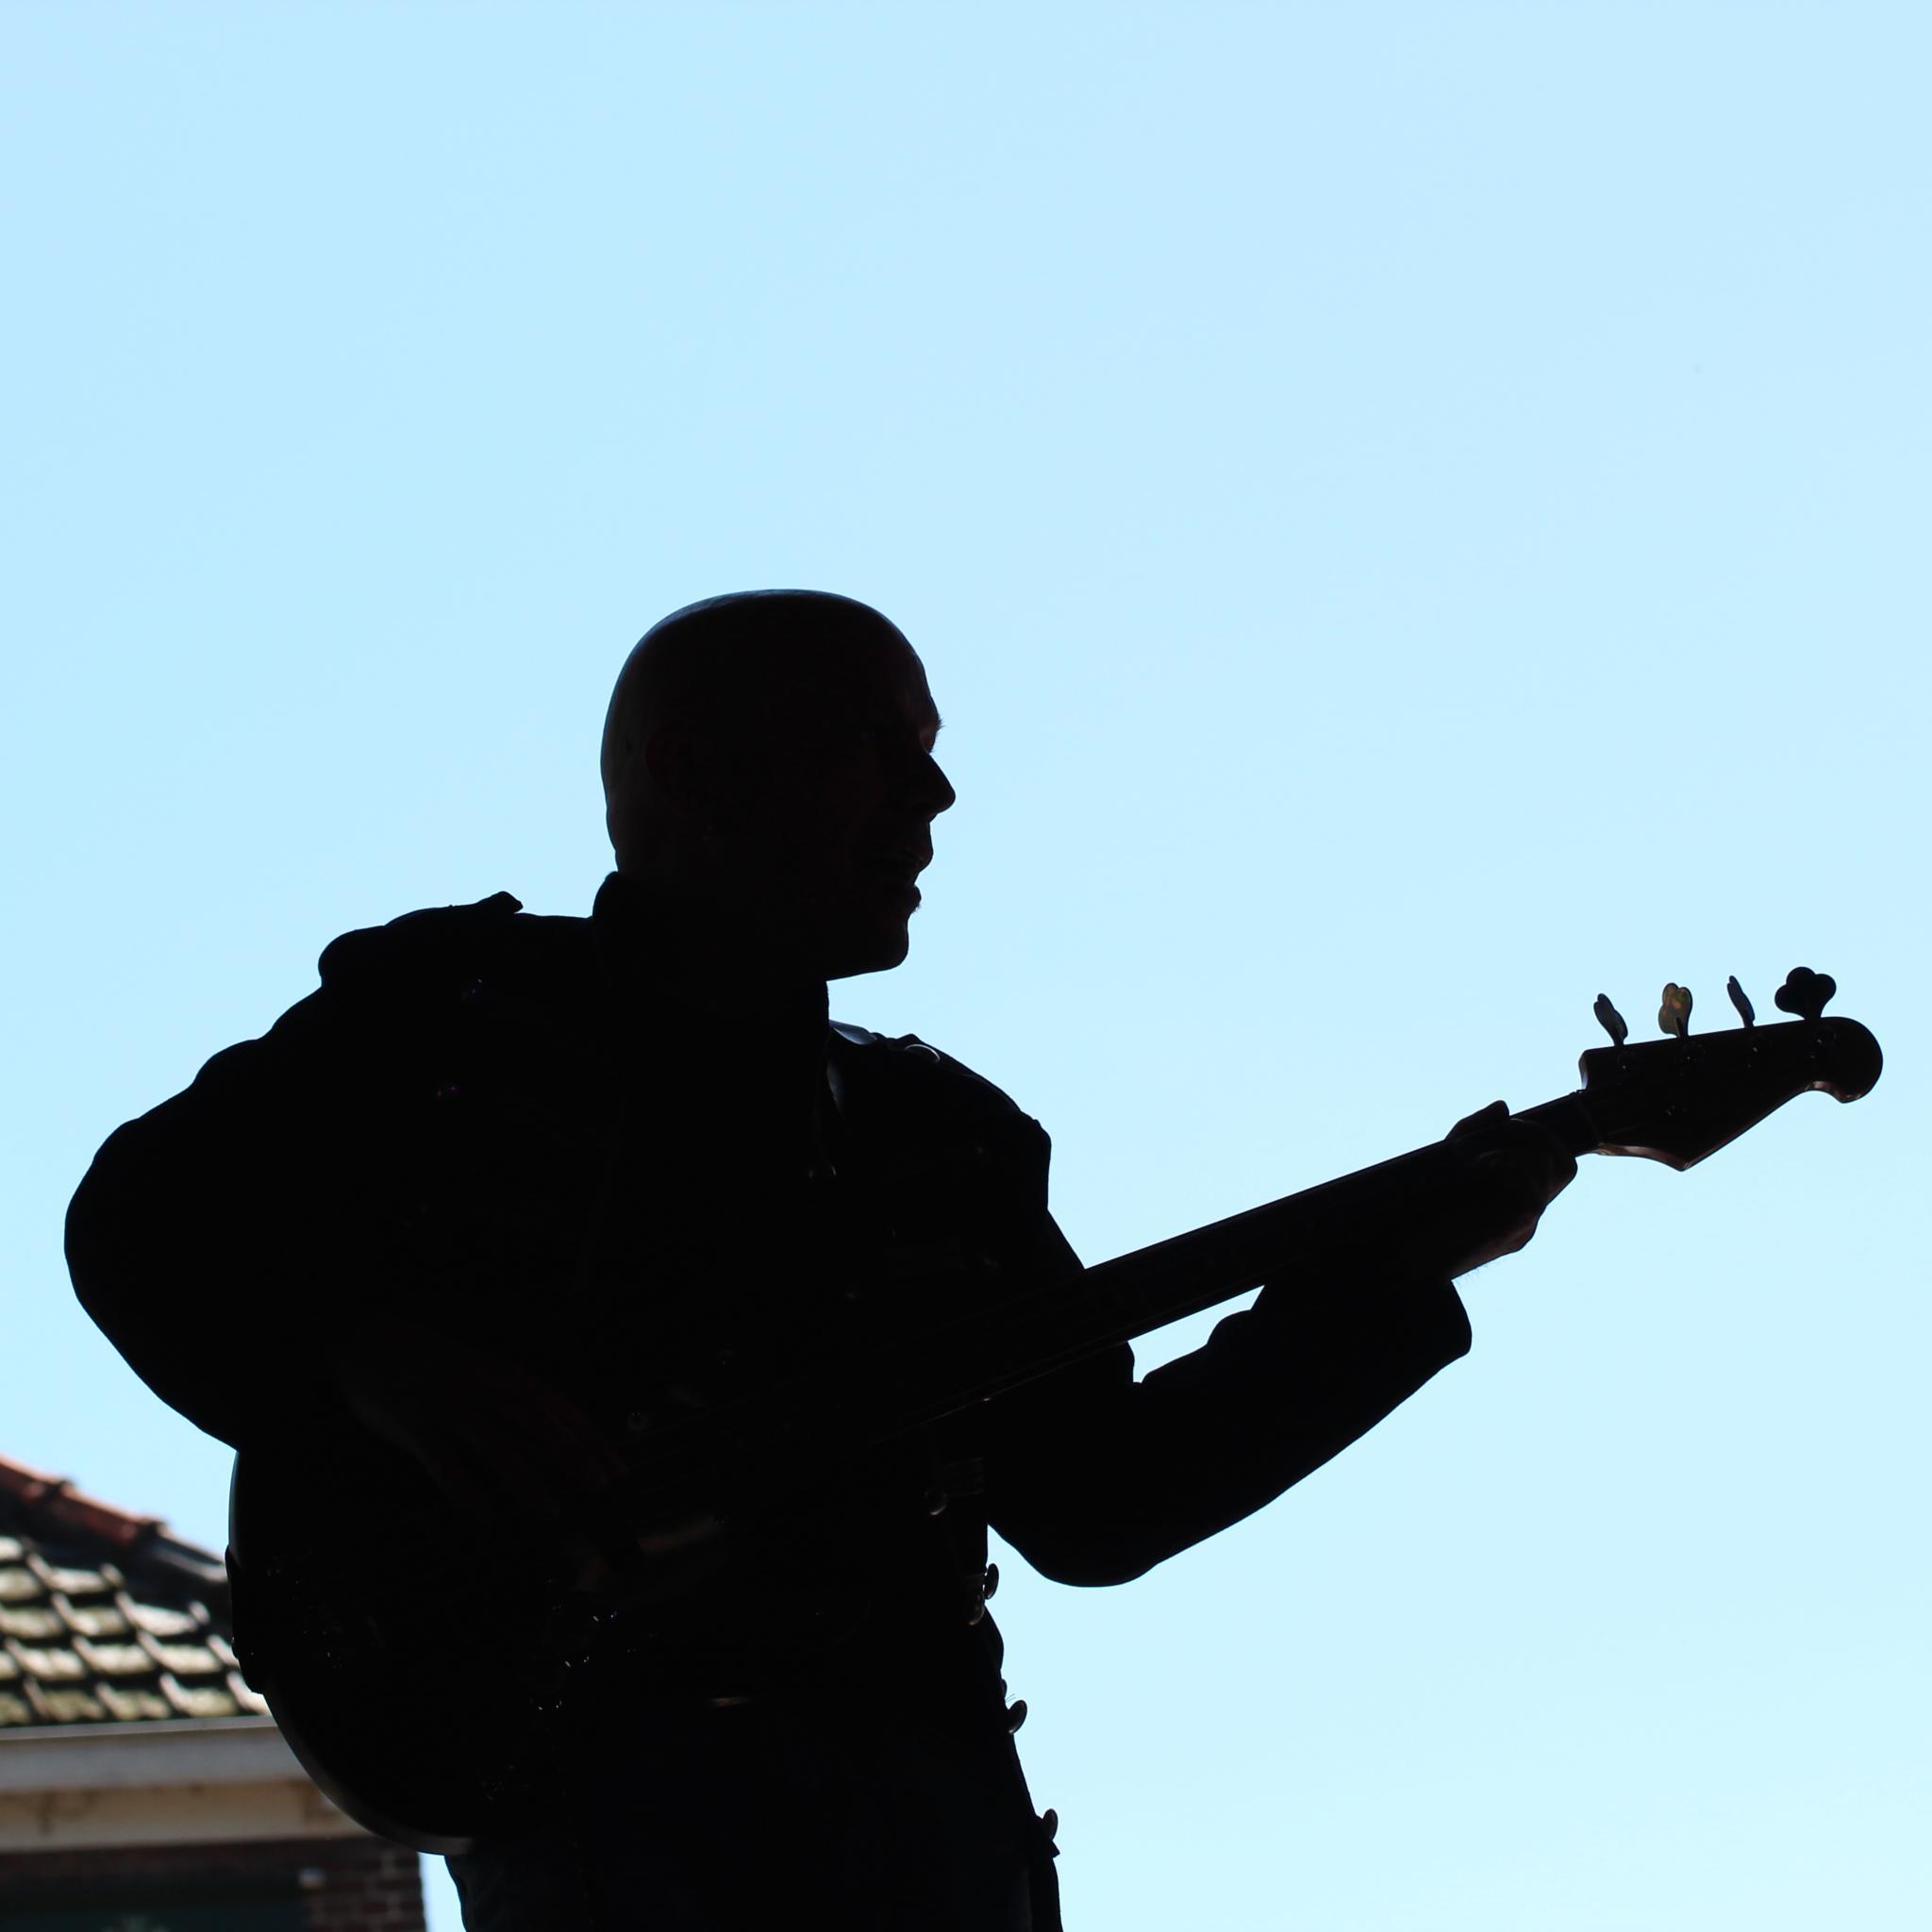 Bass player by Henk de Groot